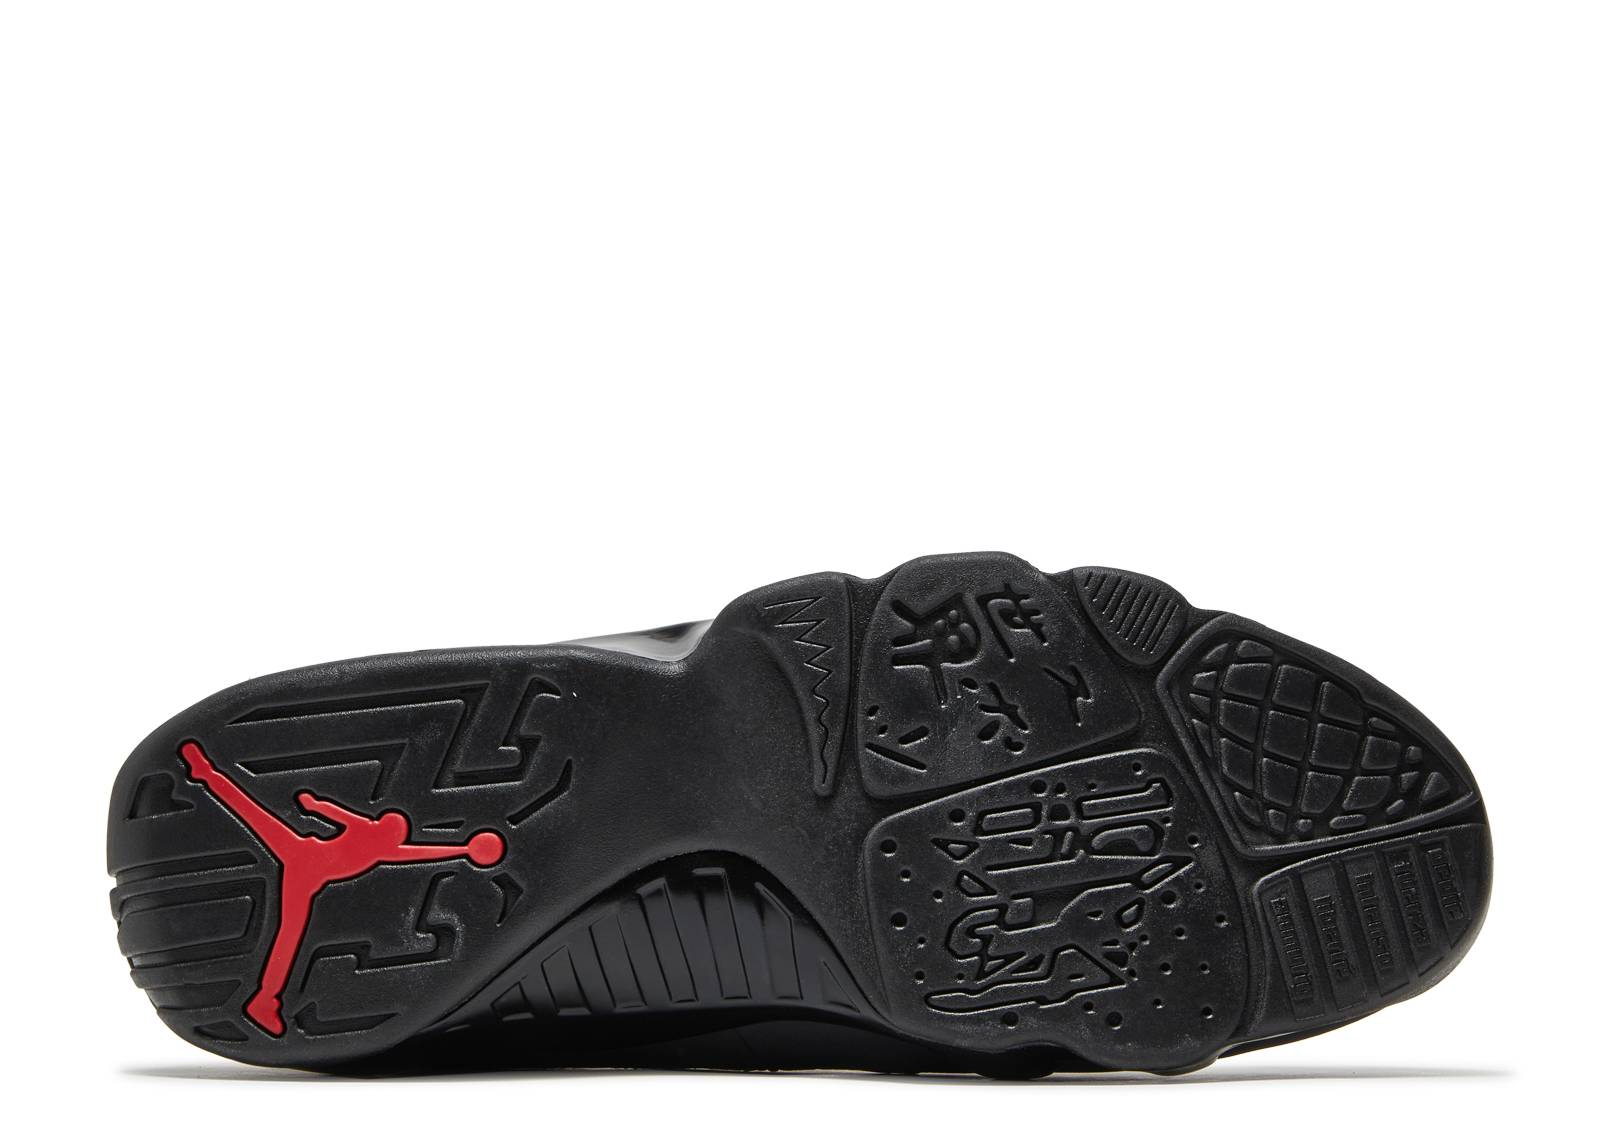 reputable site 73e91 6b65c Air Jordan 9 Retro